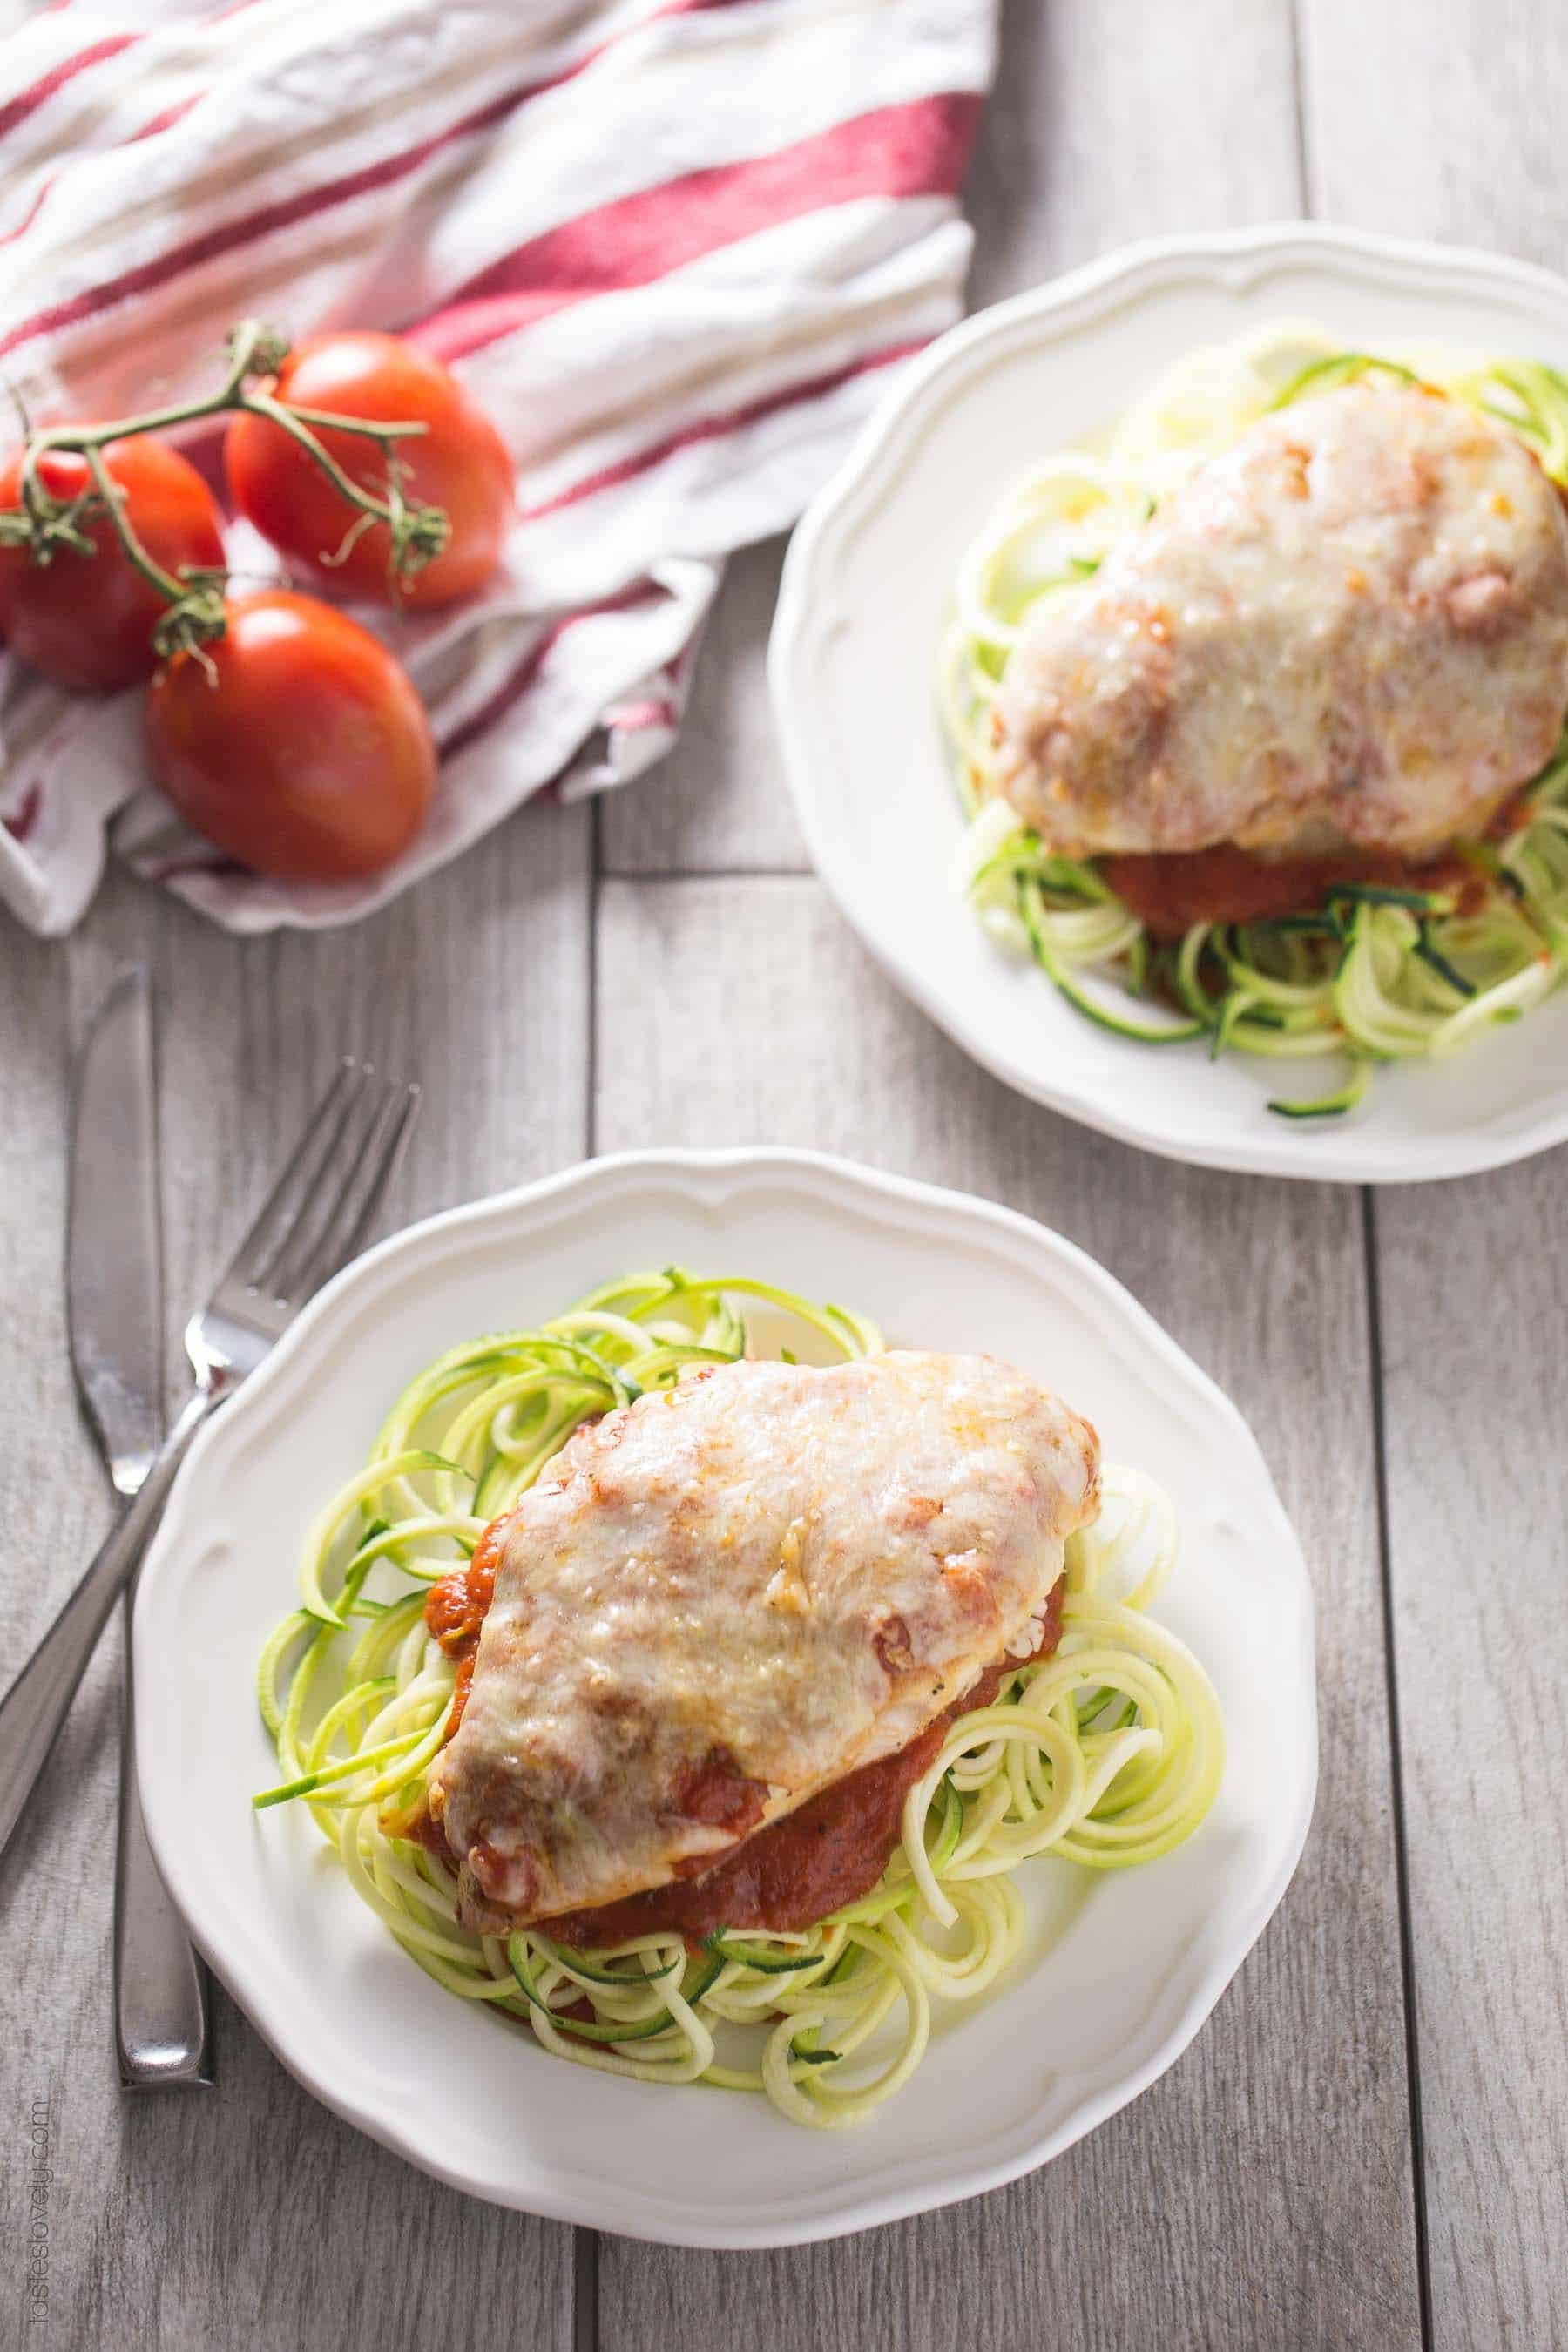 Healthy Chicken Parmesan - no breading! (gluten free, low carb)